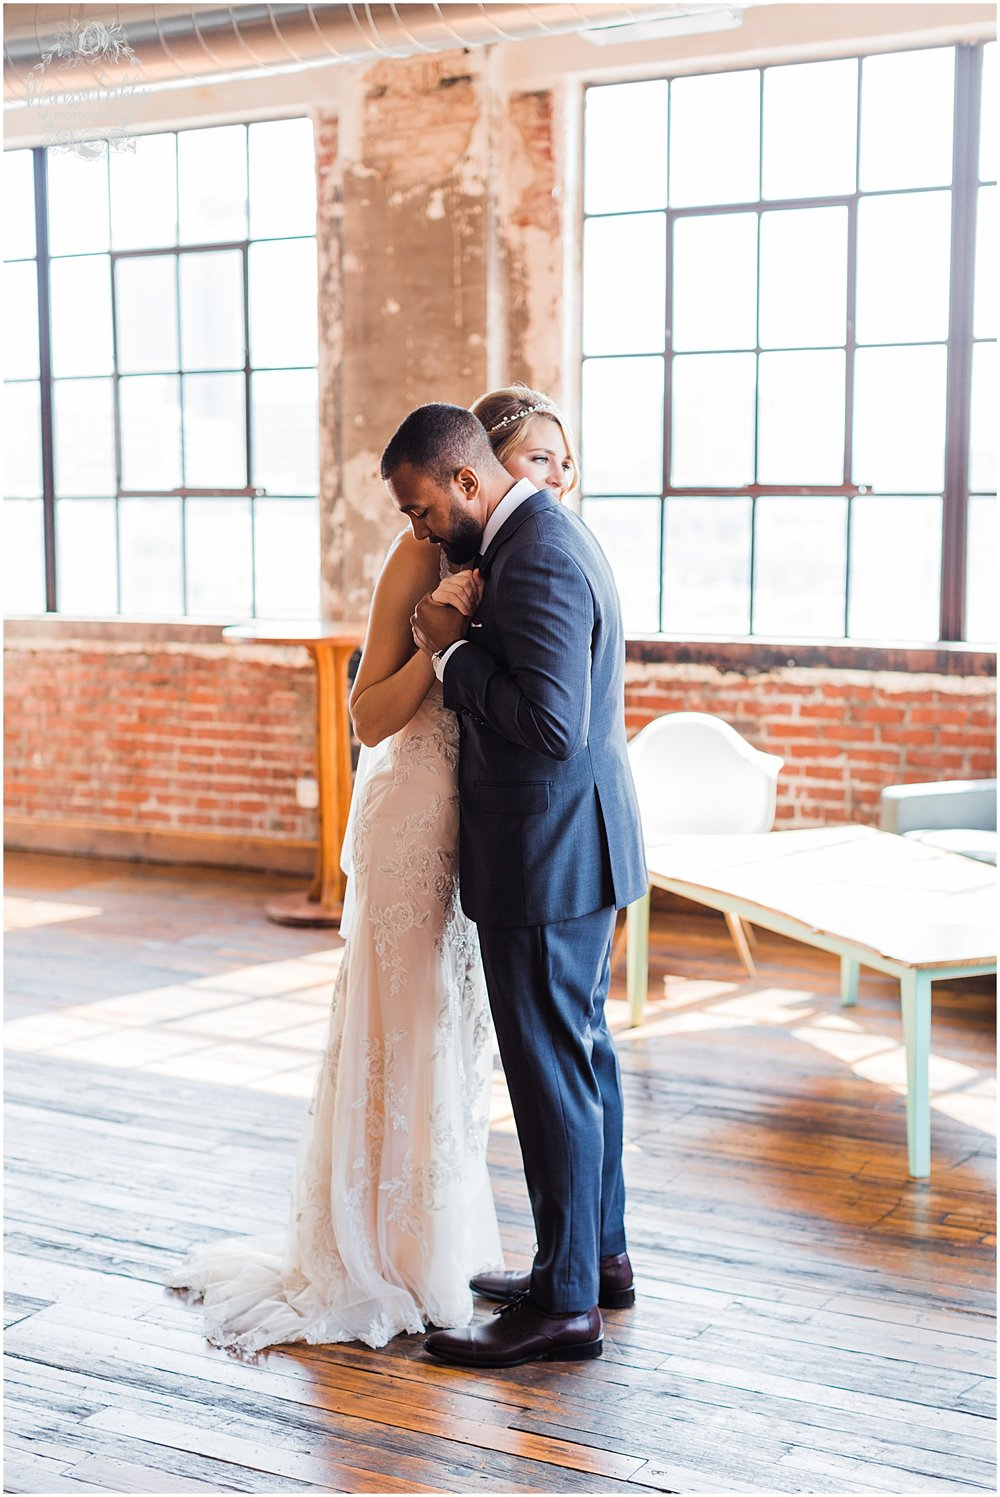 BAUER WEDDING | KELSEA & JUSTIN | MARISSA CRIBBS PHOTOGRAPHY_6508.jpg